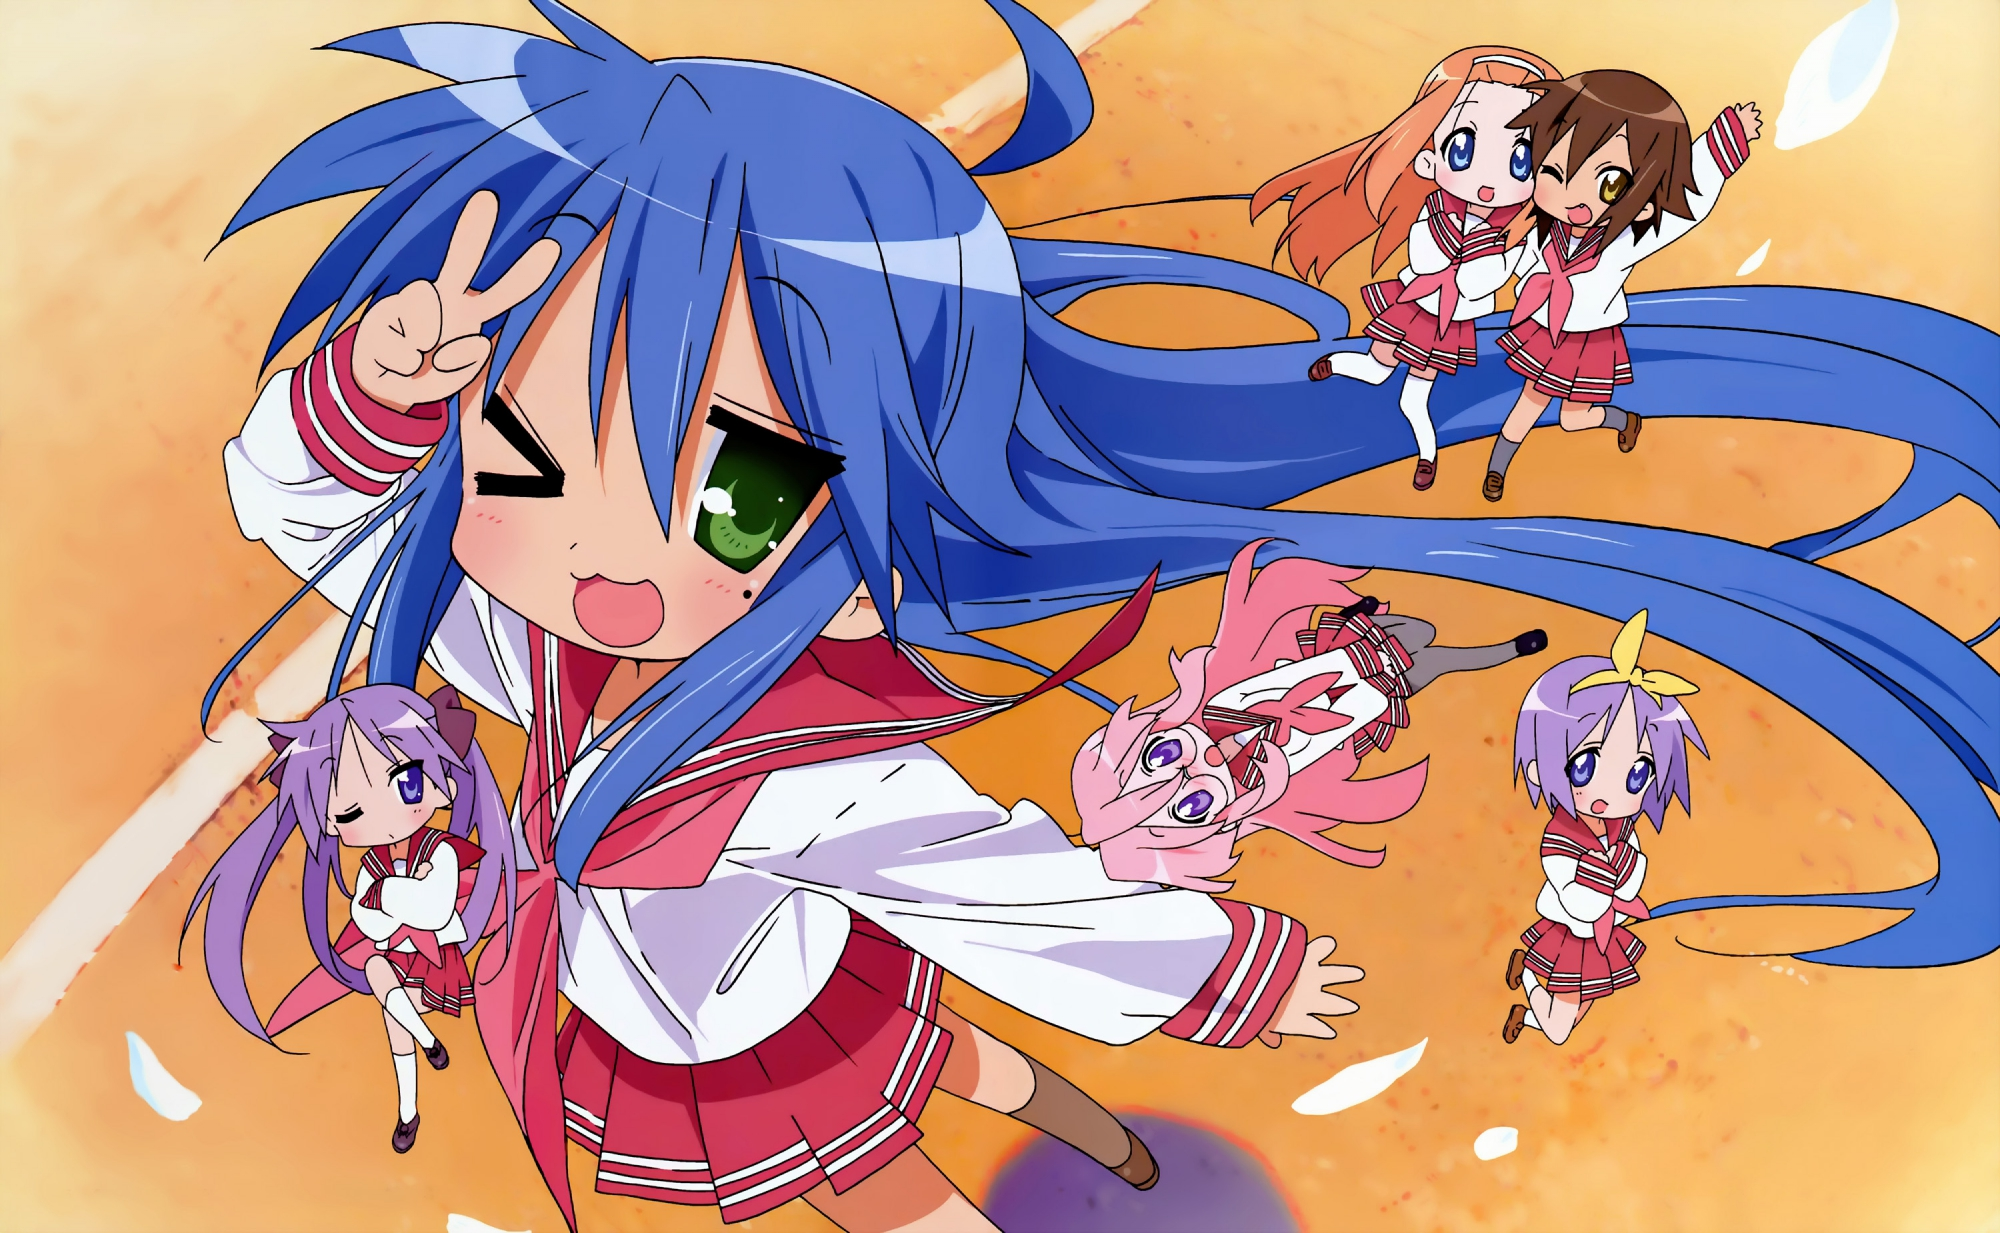 blue_hair glasses green_eyes hiiragi_kagami hiiragi_tsukasa horiguchi_yukiko izumi_konata kusakabe_misao lucky_star minegishi_ayano pink_hair purple_hair school_uniform takara_miyuki wink